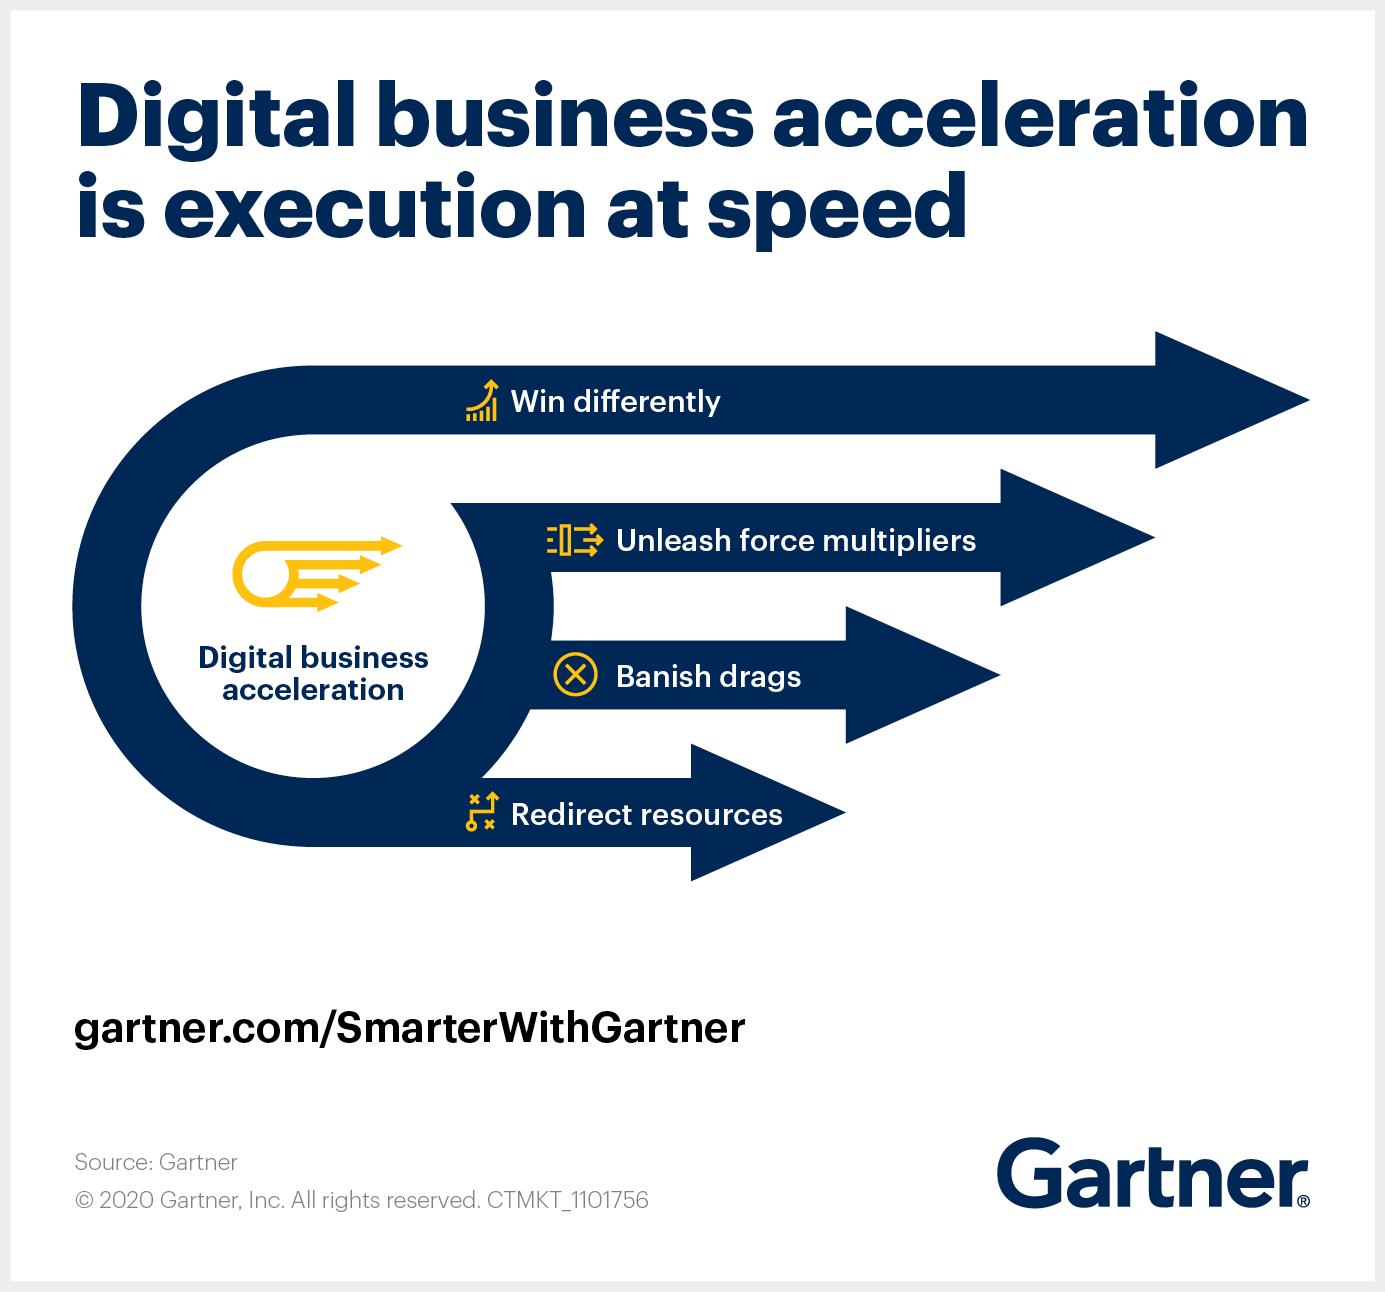 4 Key acceleration tactics for digital business leaders